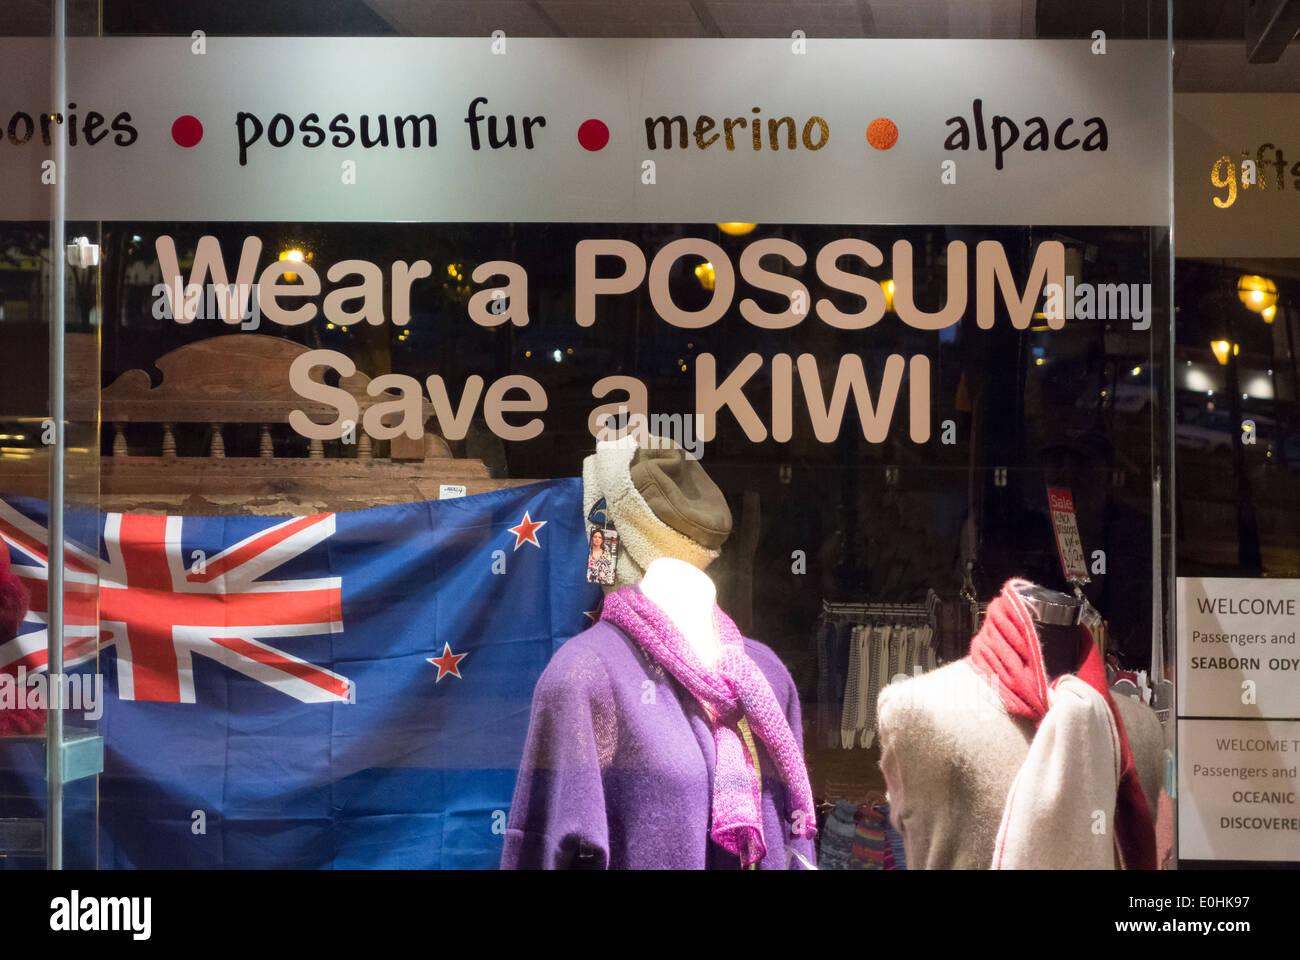 Wear A Possum Save A Kiwi Shop window in Dunedin New Zealand promoting possum-merino wool to combat invasive species pest - Stock Image